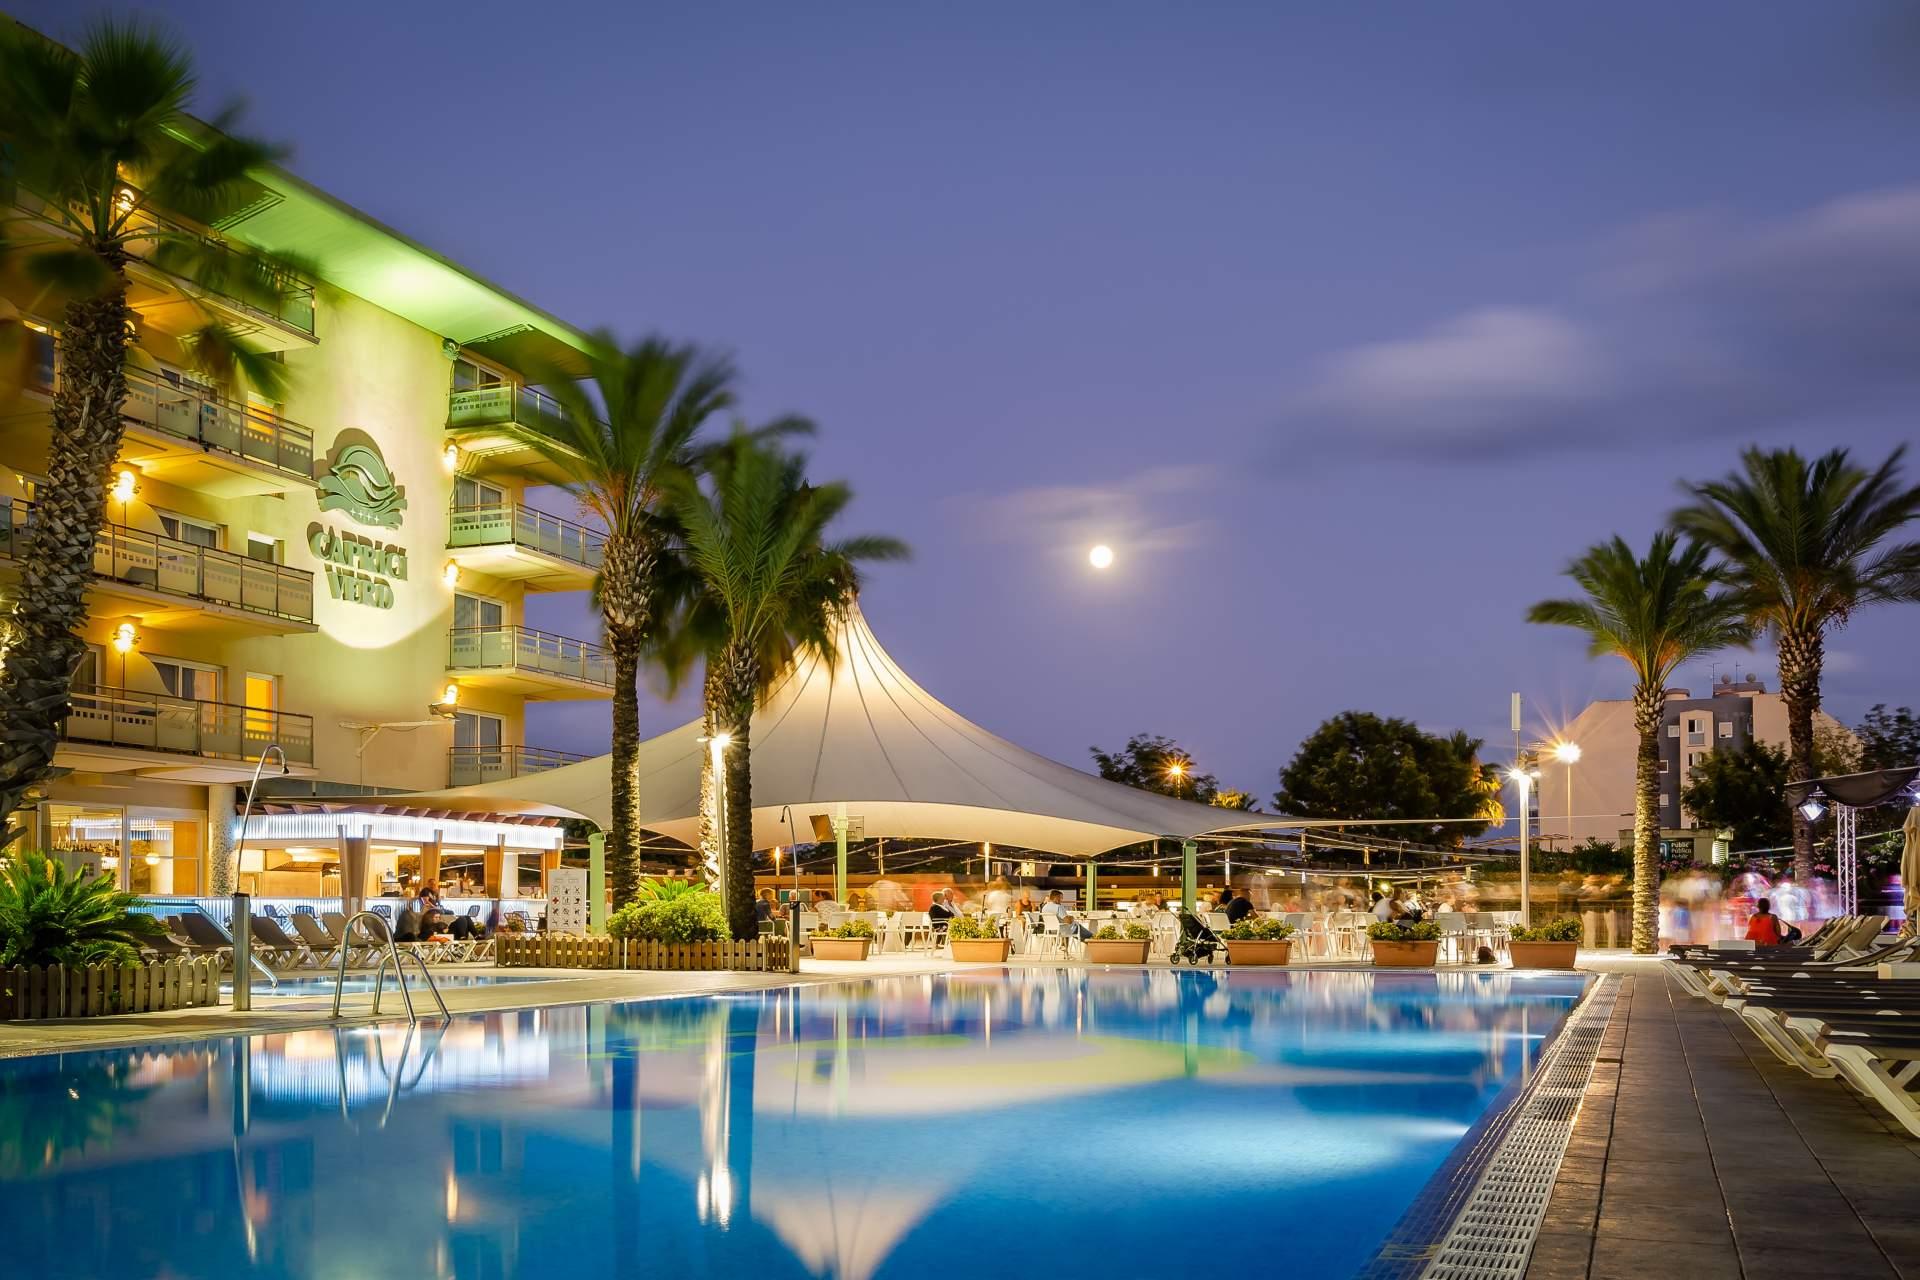 Santa Susanna -  Hotel Alegria Caprici Verd